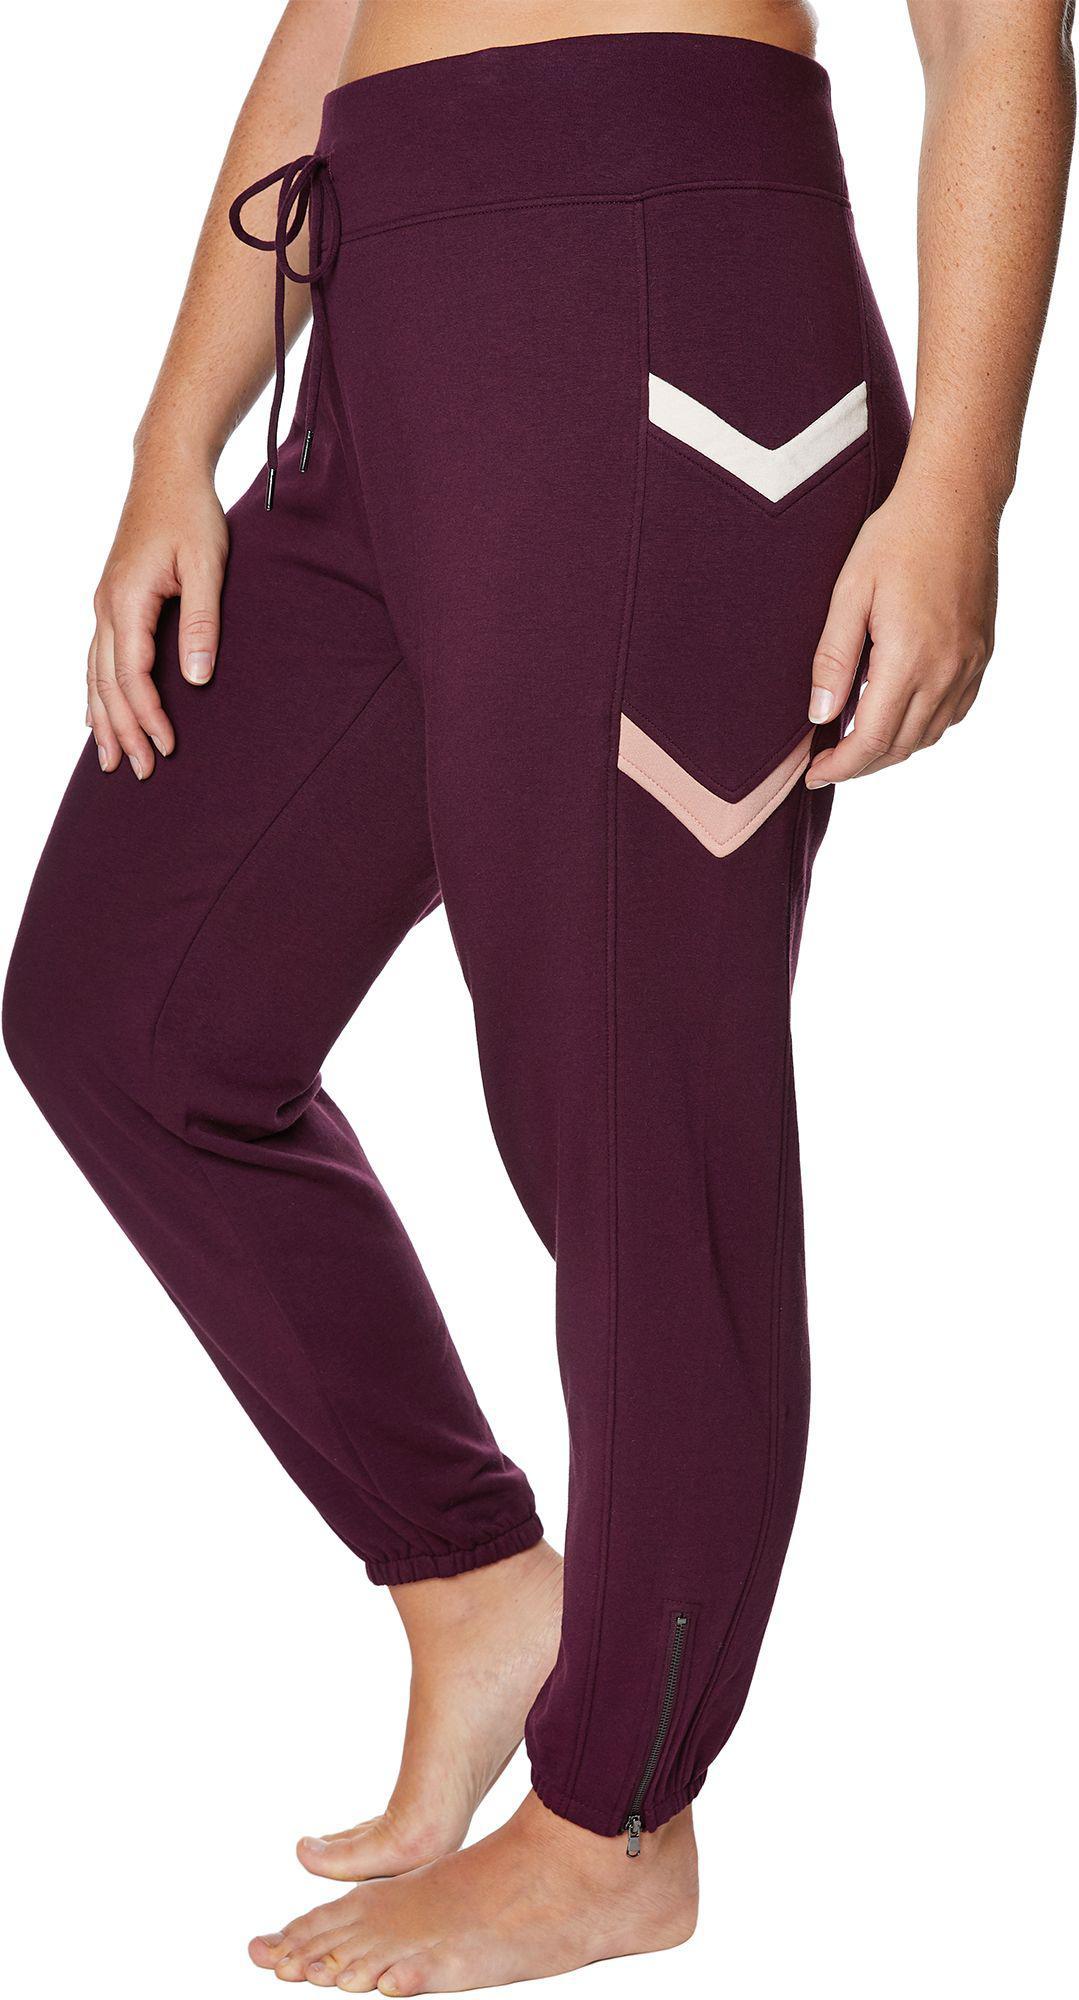 5fd38584f3b Betsey Johnson - Purple Plus Size Chevron Colorblock Sweatpants - Lyst.  View fullscreen